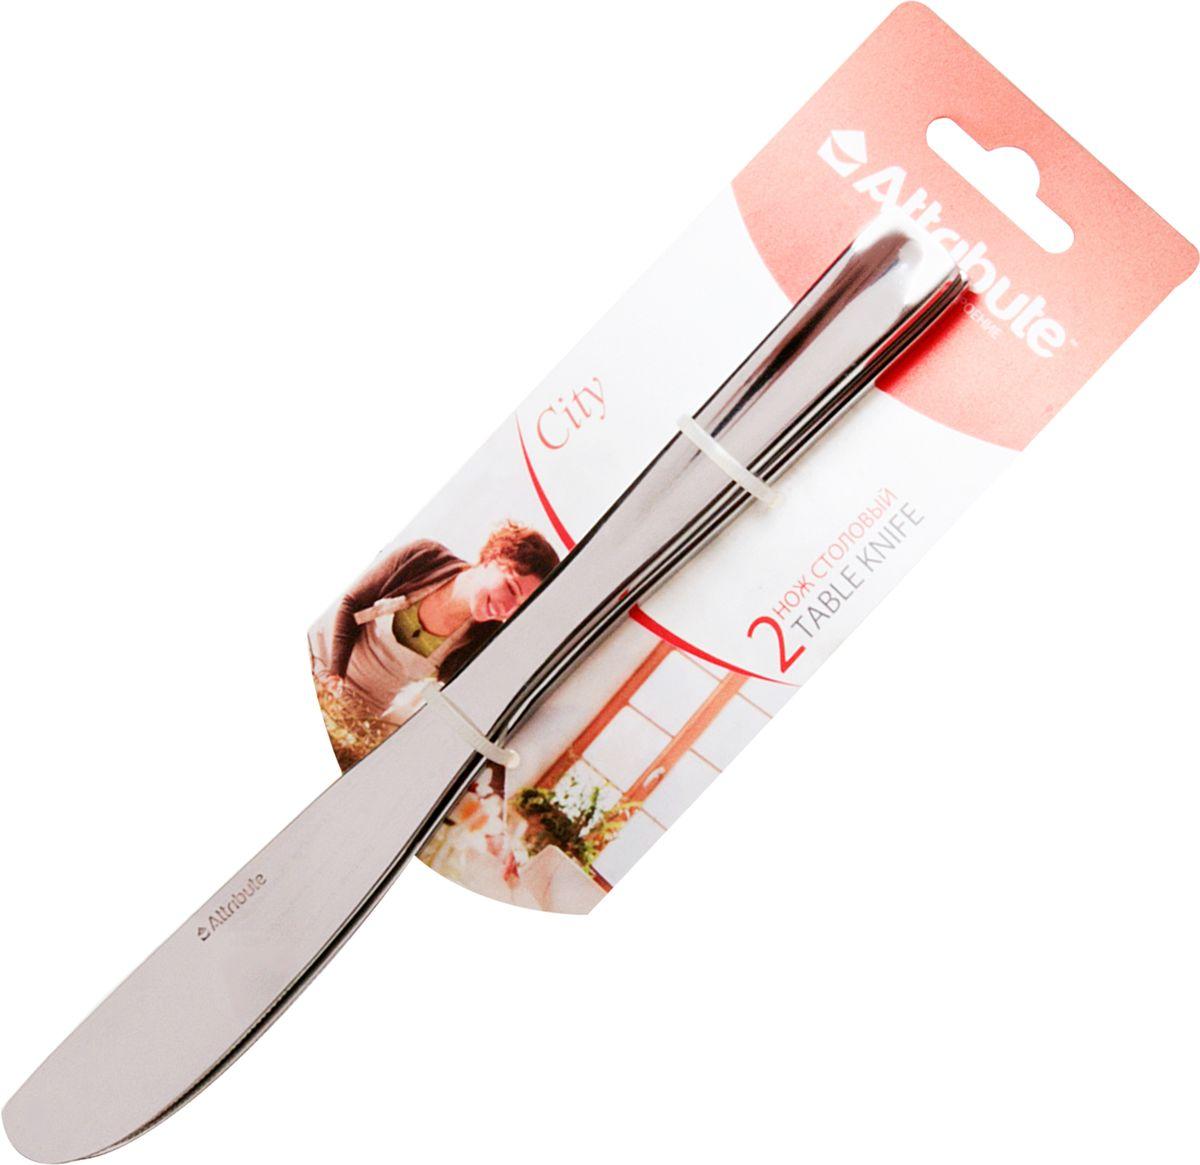 Нож столовый Attribute City, цвет: серебристый, 2 шт нож столовый attribute chaplet цвет серебристый 2 шт